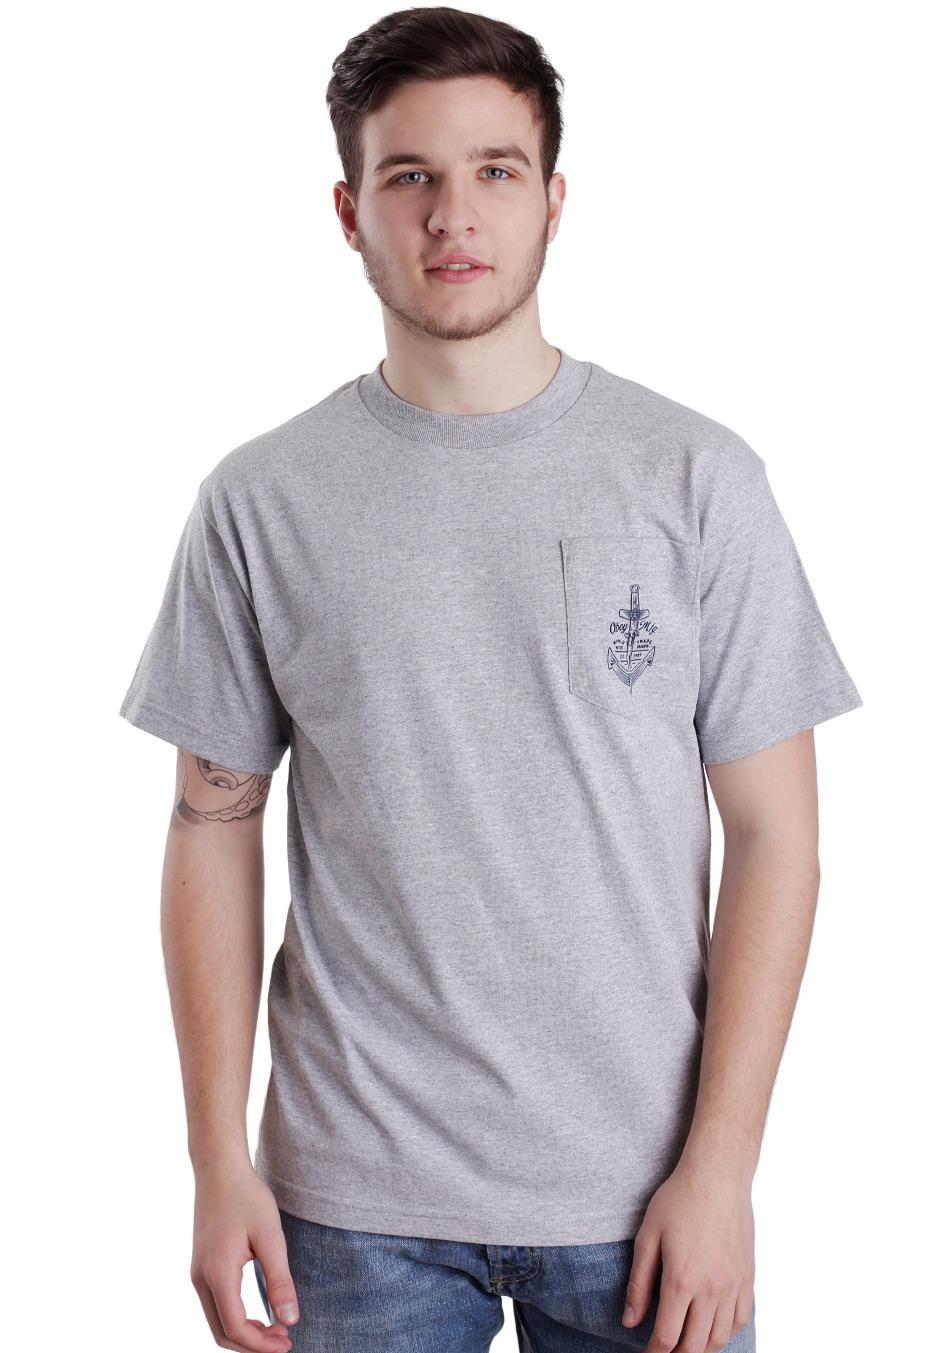 Obey Shankor Heather Grey T Shirt Uk